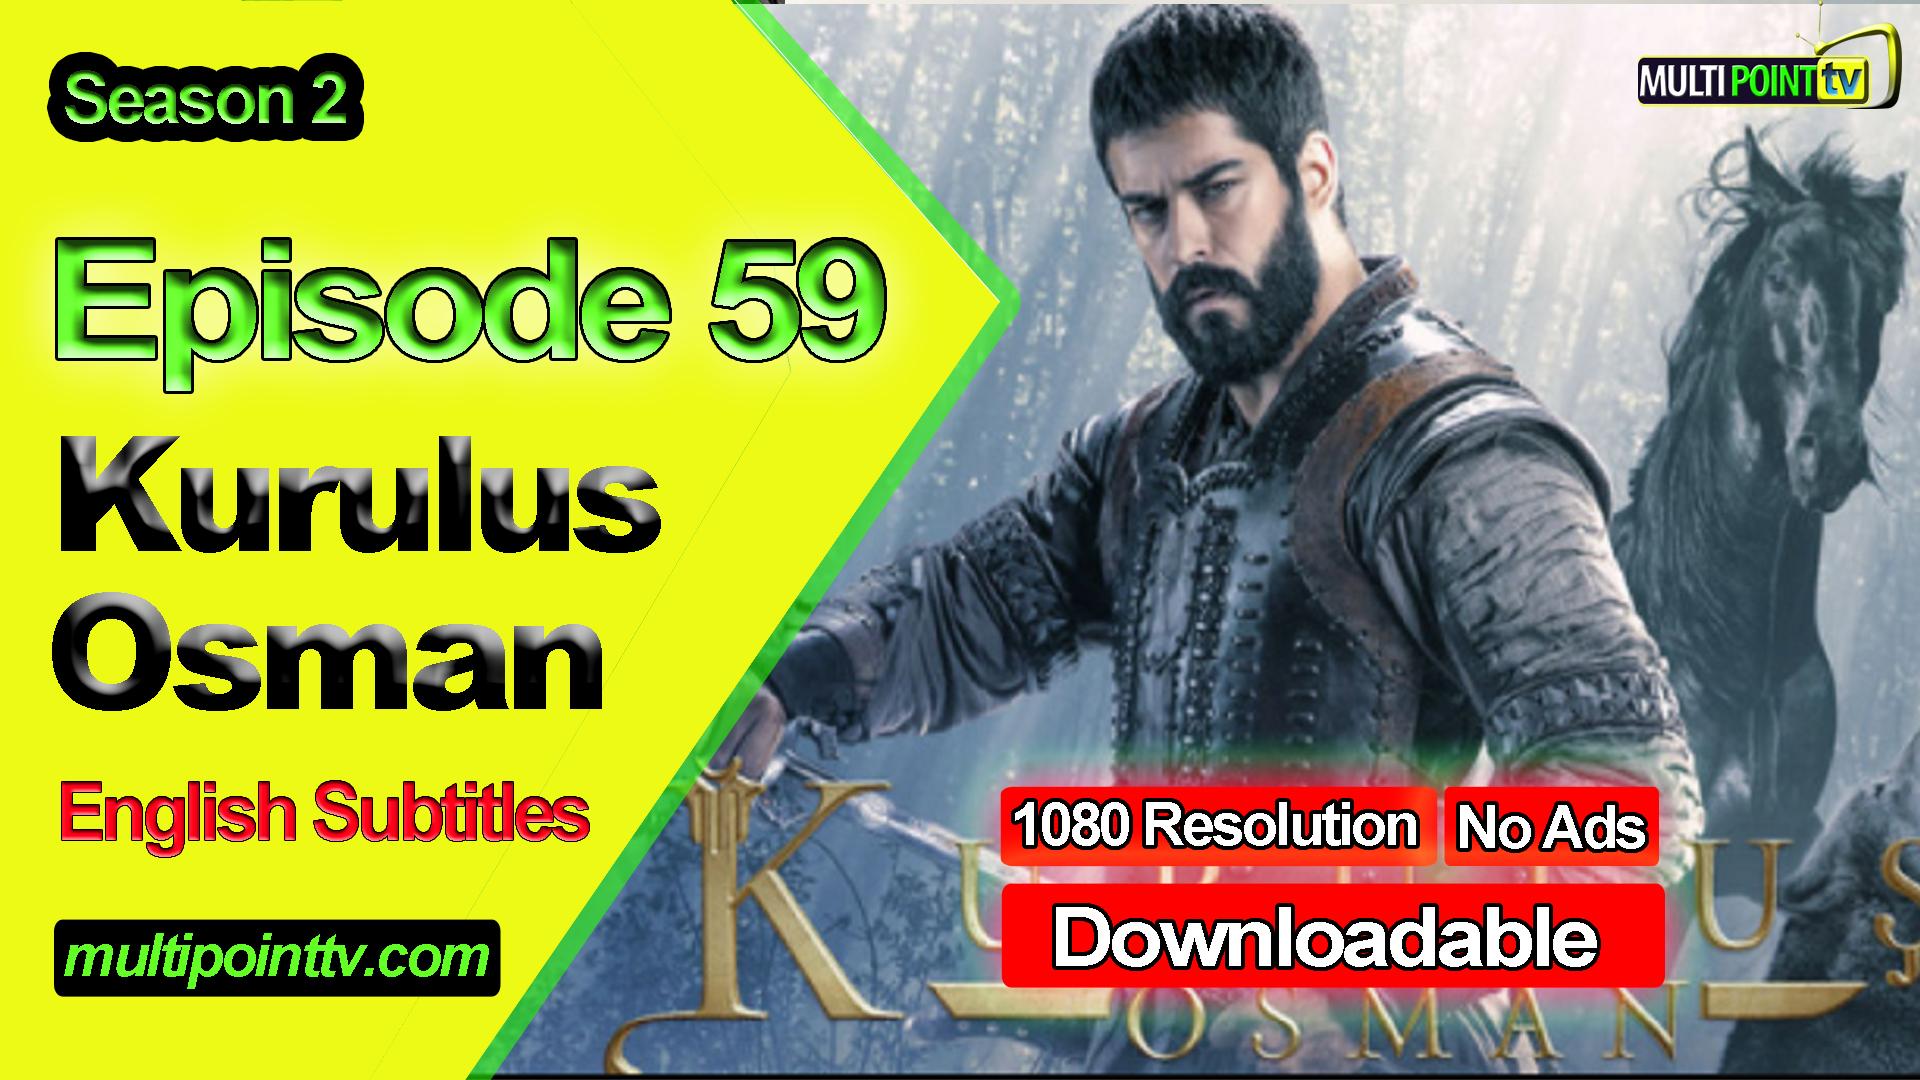 Kurulus Osman Episode 59 English Subtitles